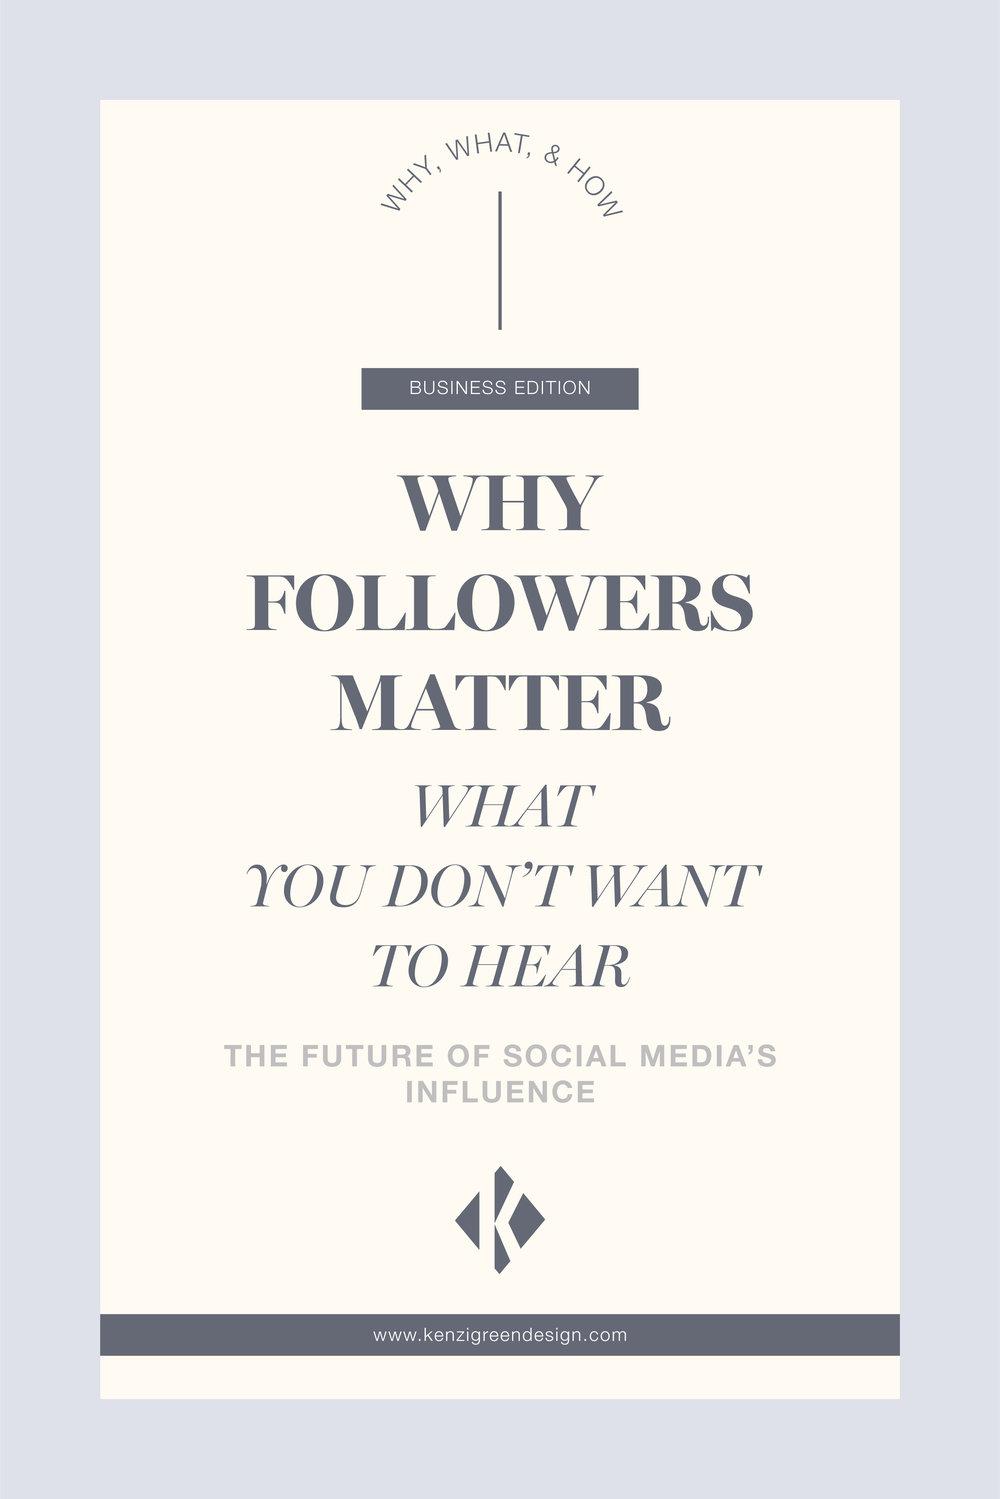 Why Followers Matter (What You Don't Want to Hear) by Kenzi Green Design #socialmedia #instagram #socialmediamarketing